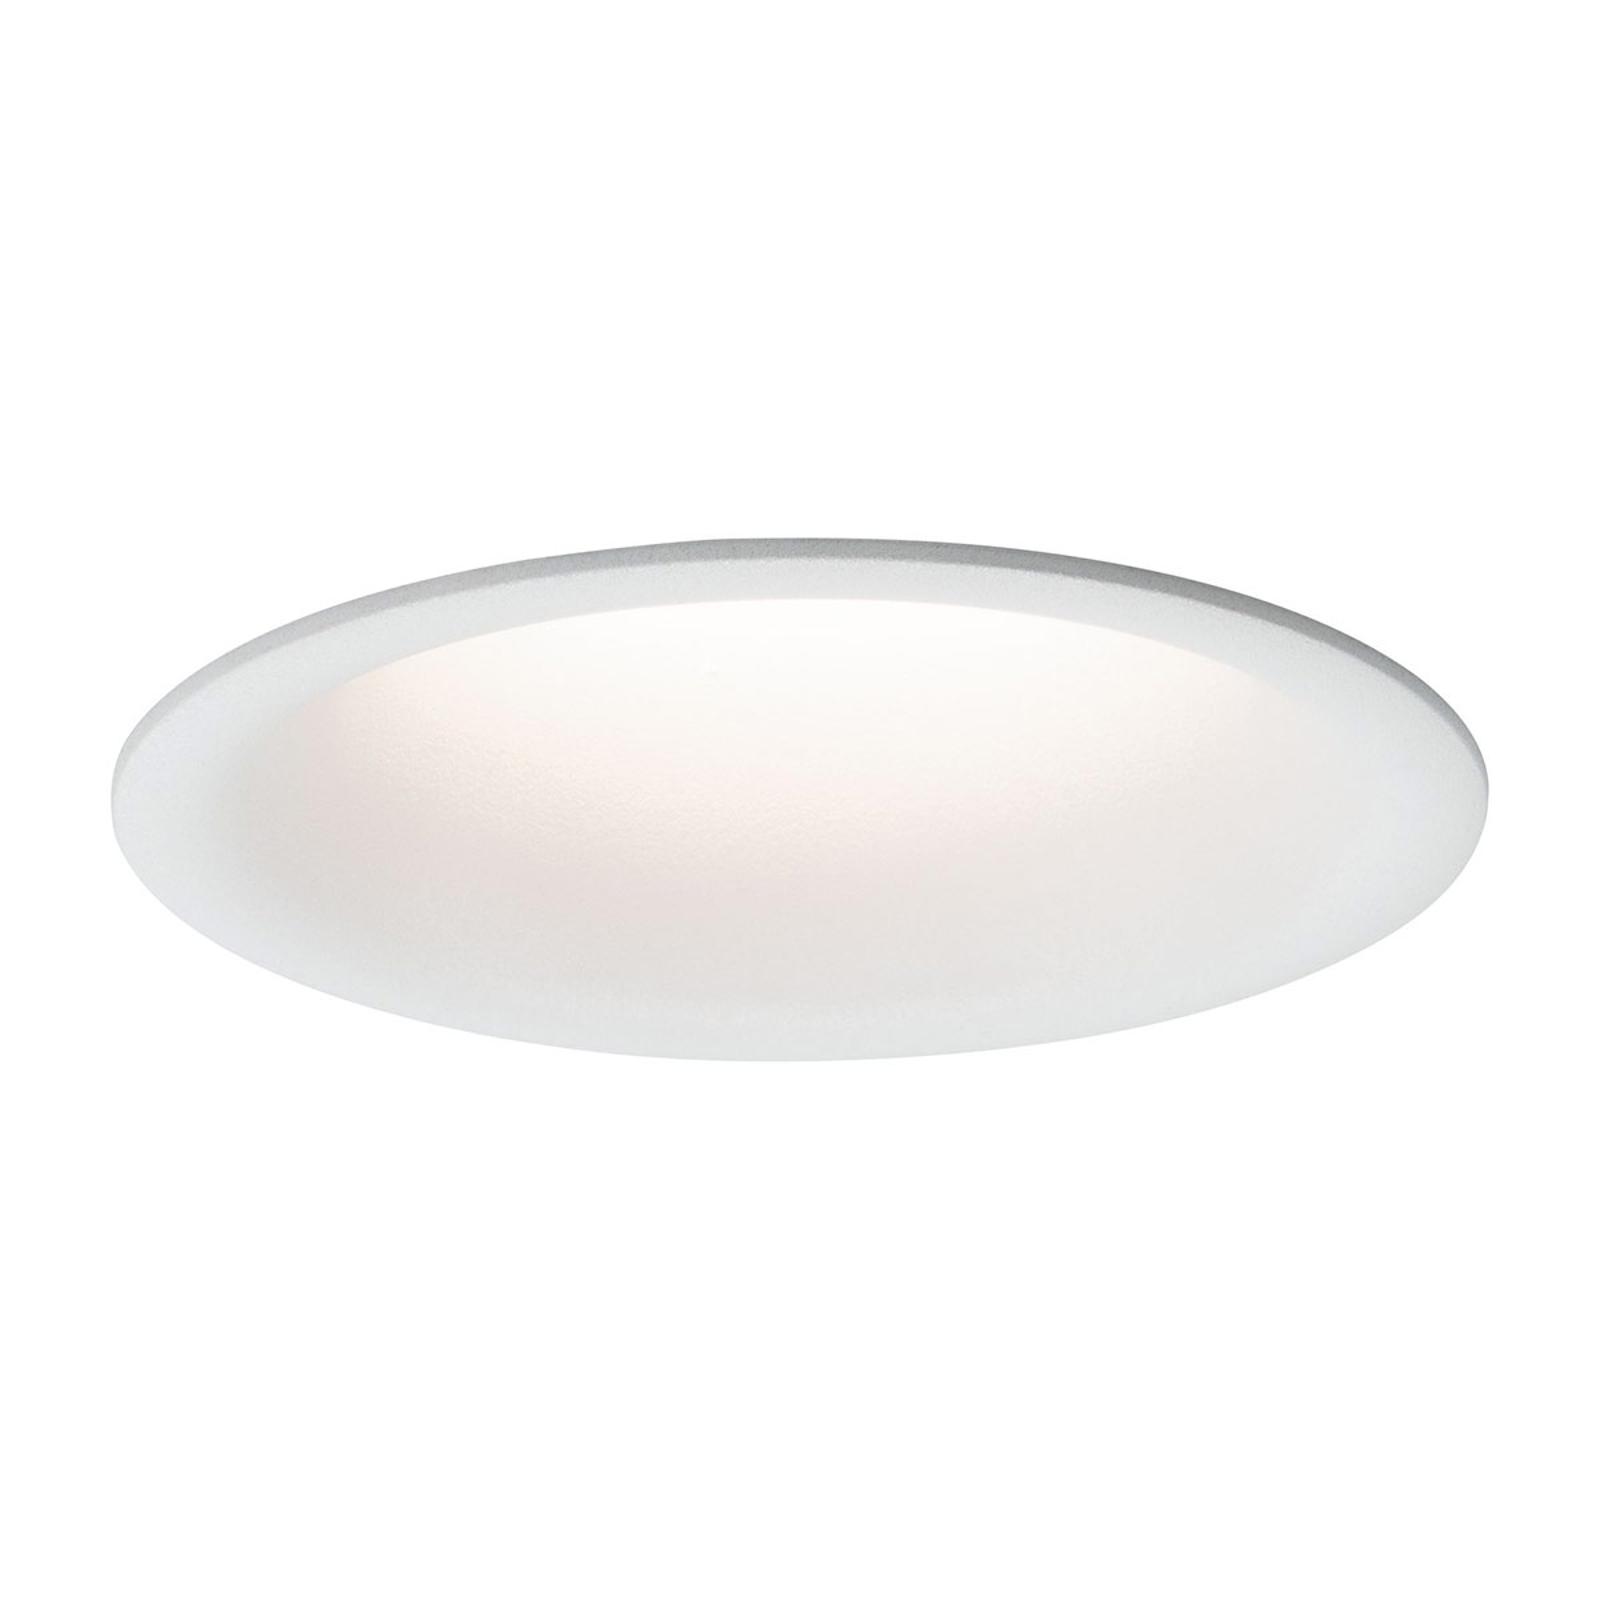 Paulmann downlight LED Cymbal 1x6,8W IP44